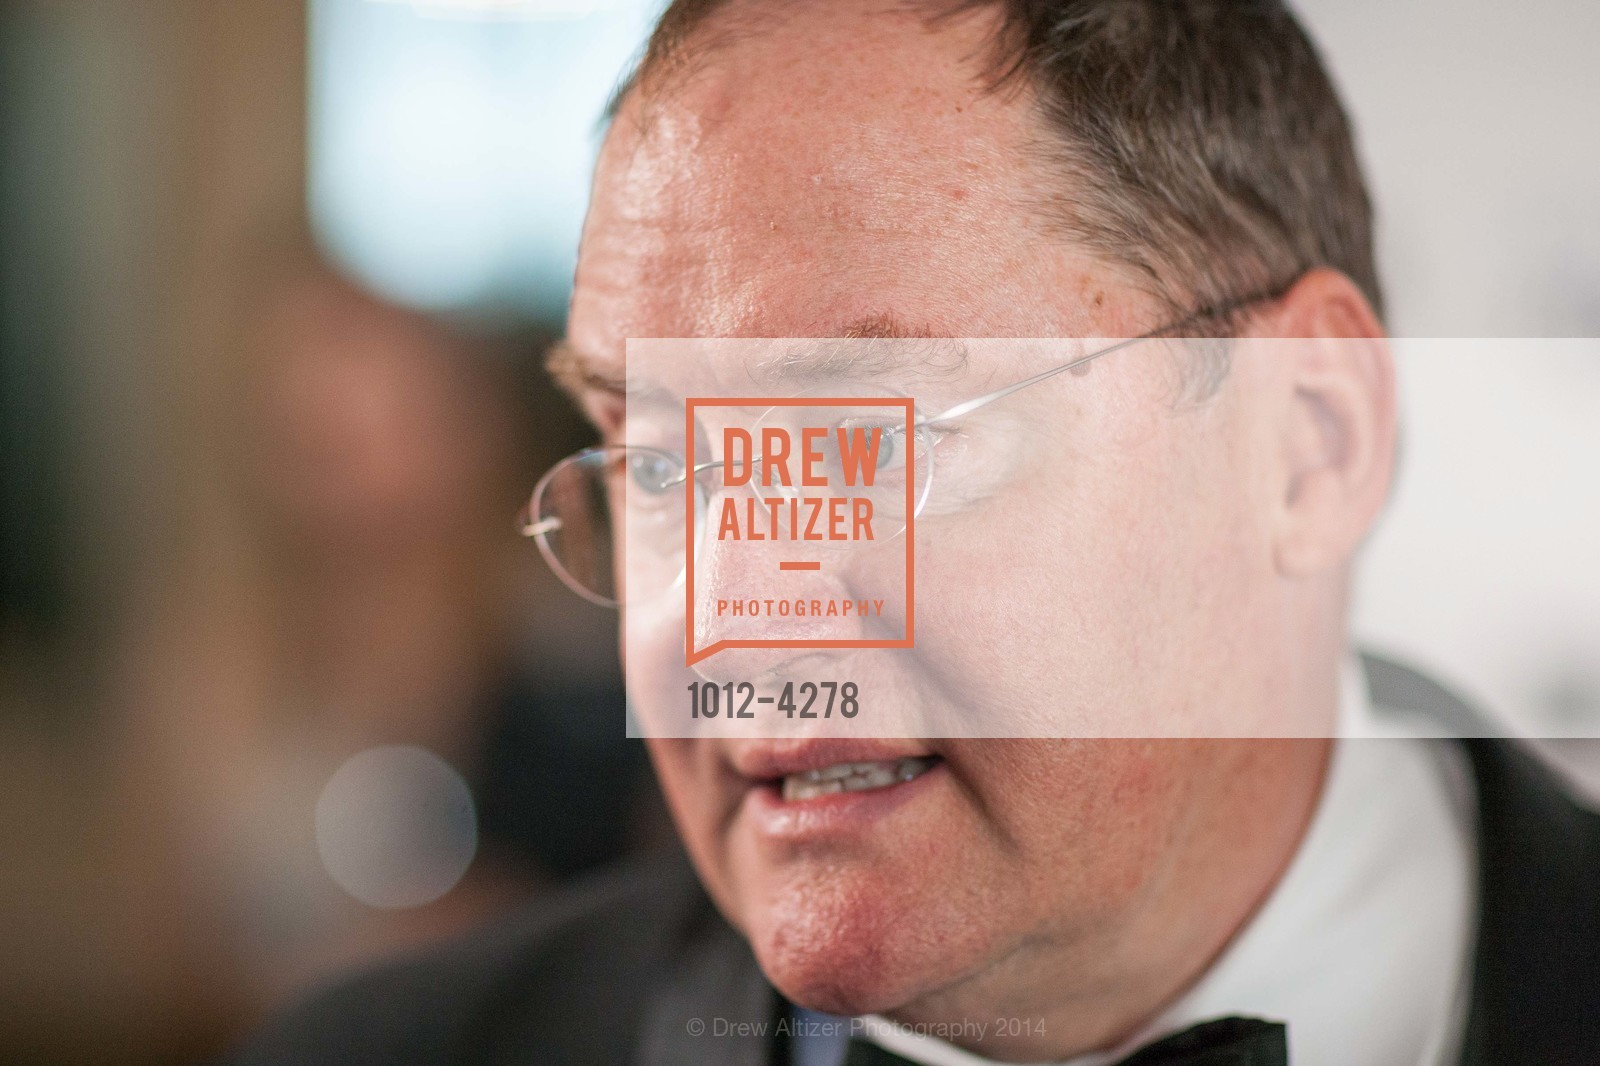 John Lasseter, Photo #1012-4278